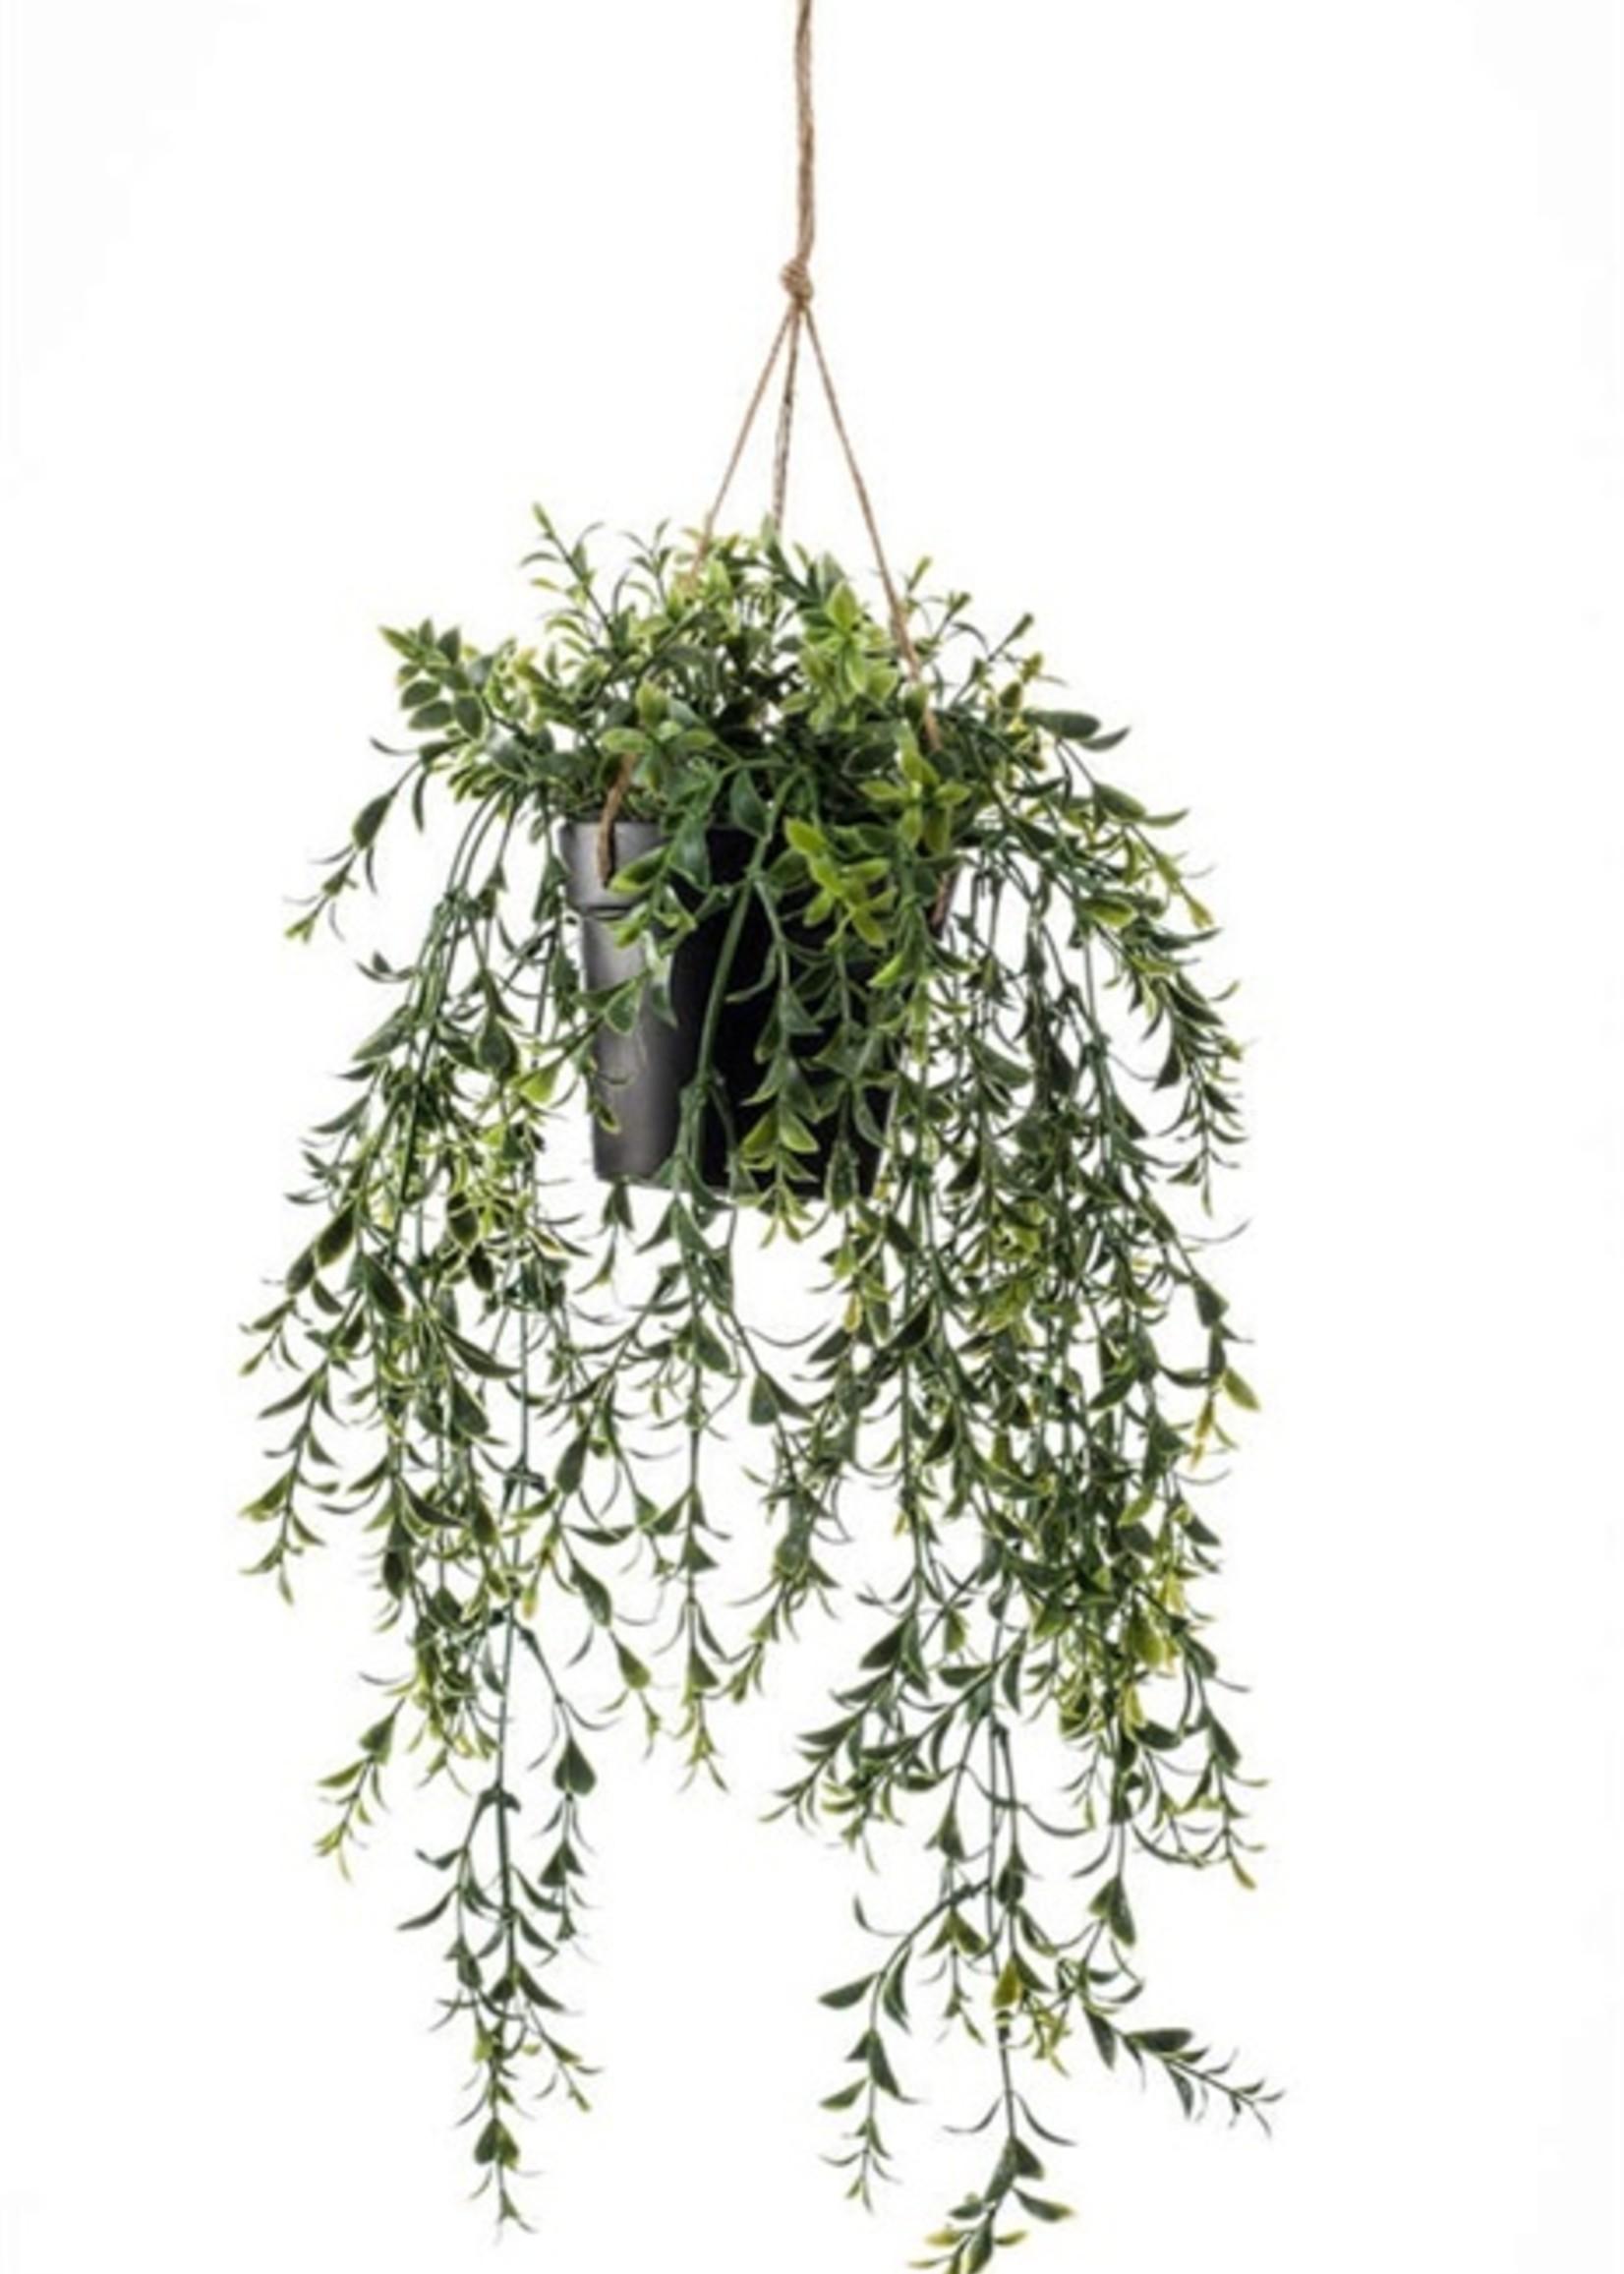 Emerald Eternal Green Boxwood hanging 50cm in pot